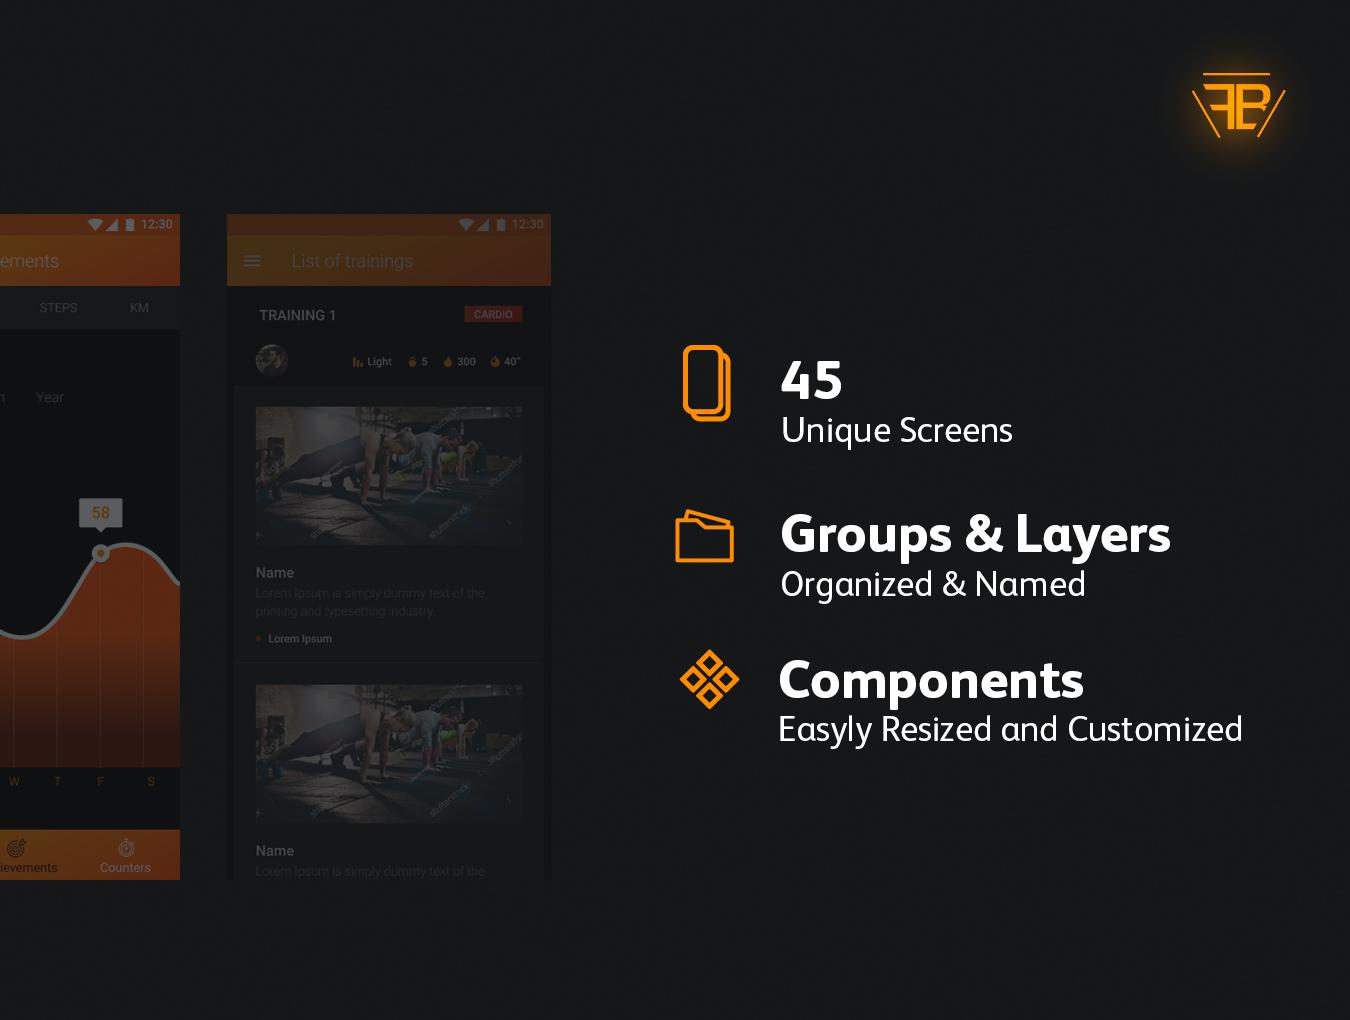 高质量健身旅行商城购物Android UI工具包 FIT BIT Sport UI Kit插图(1)